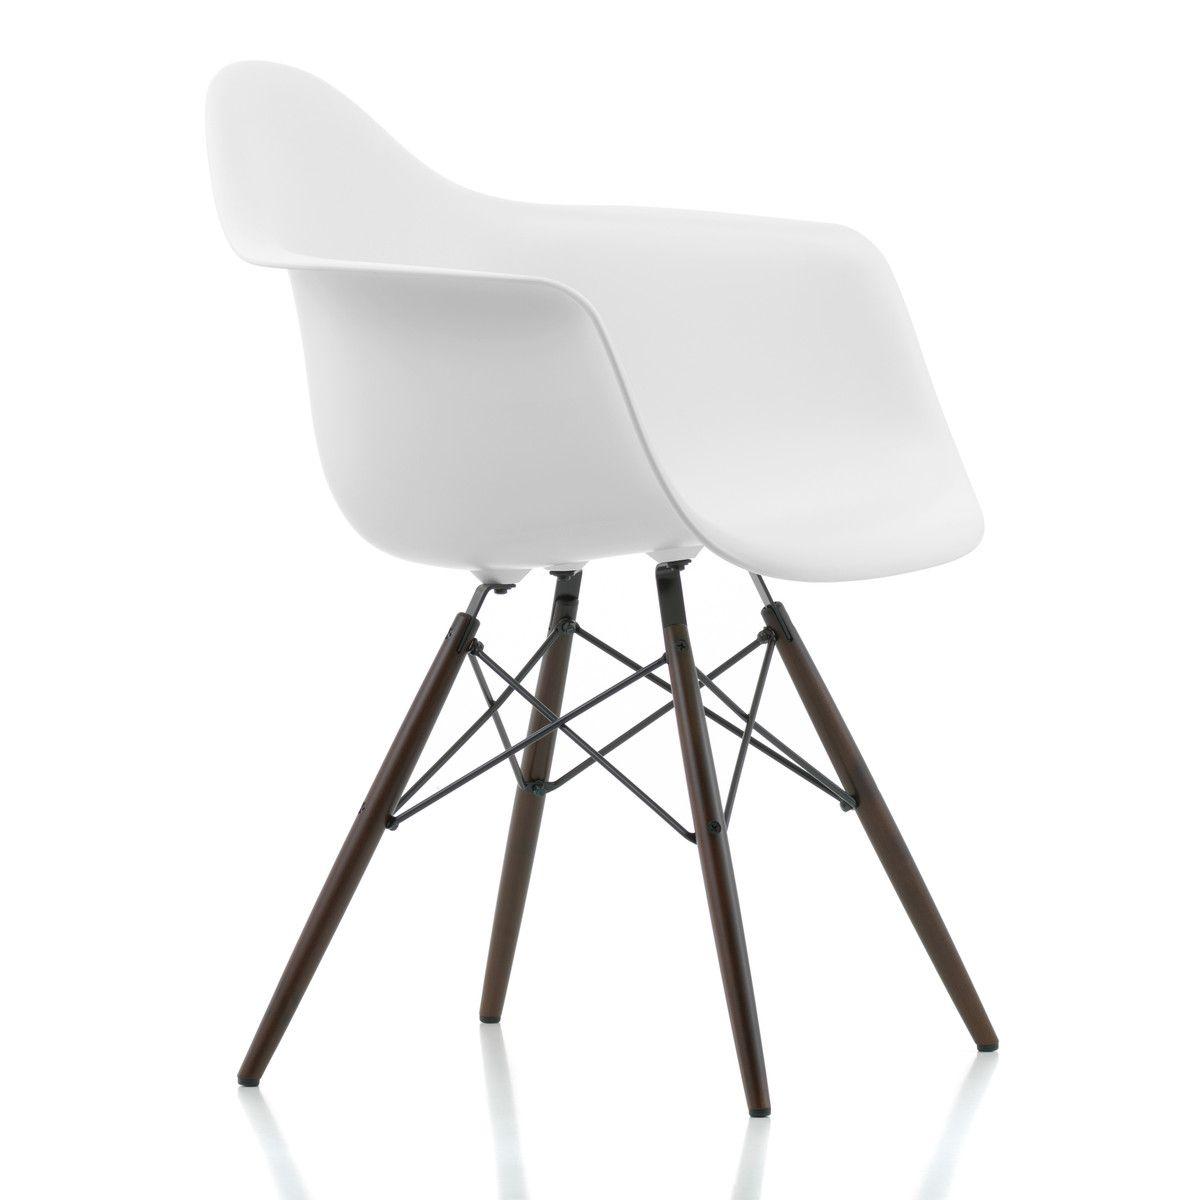 Vitra Eames Plastic Armchair DAW, Ahorn gelblich / weiß